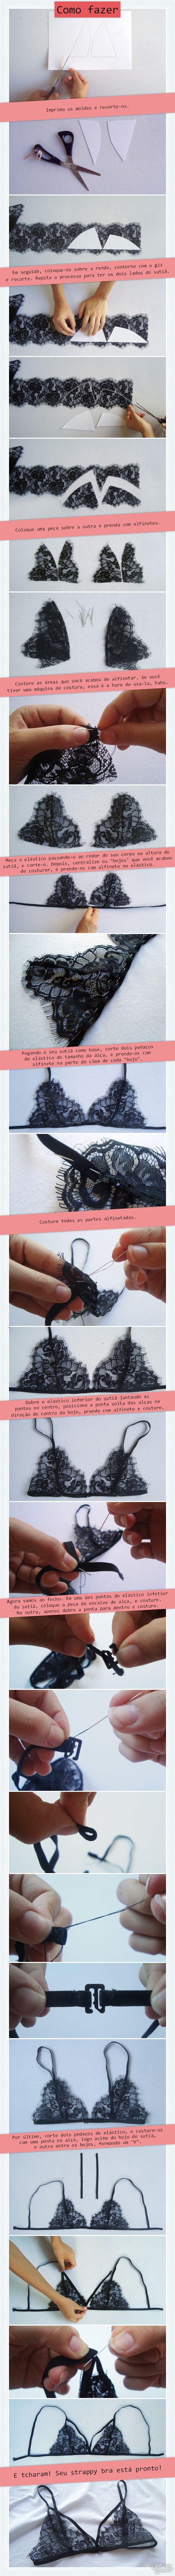 DIY Strappy Bra | Lace bra | http://cademeuchapeu.com: